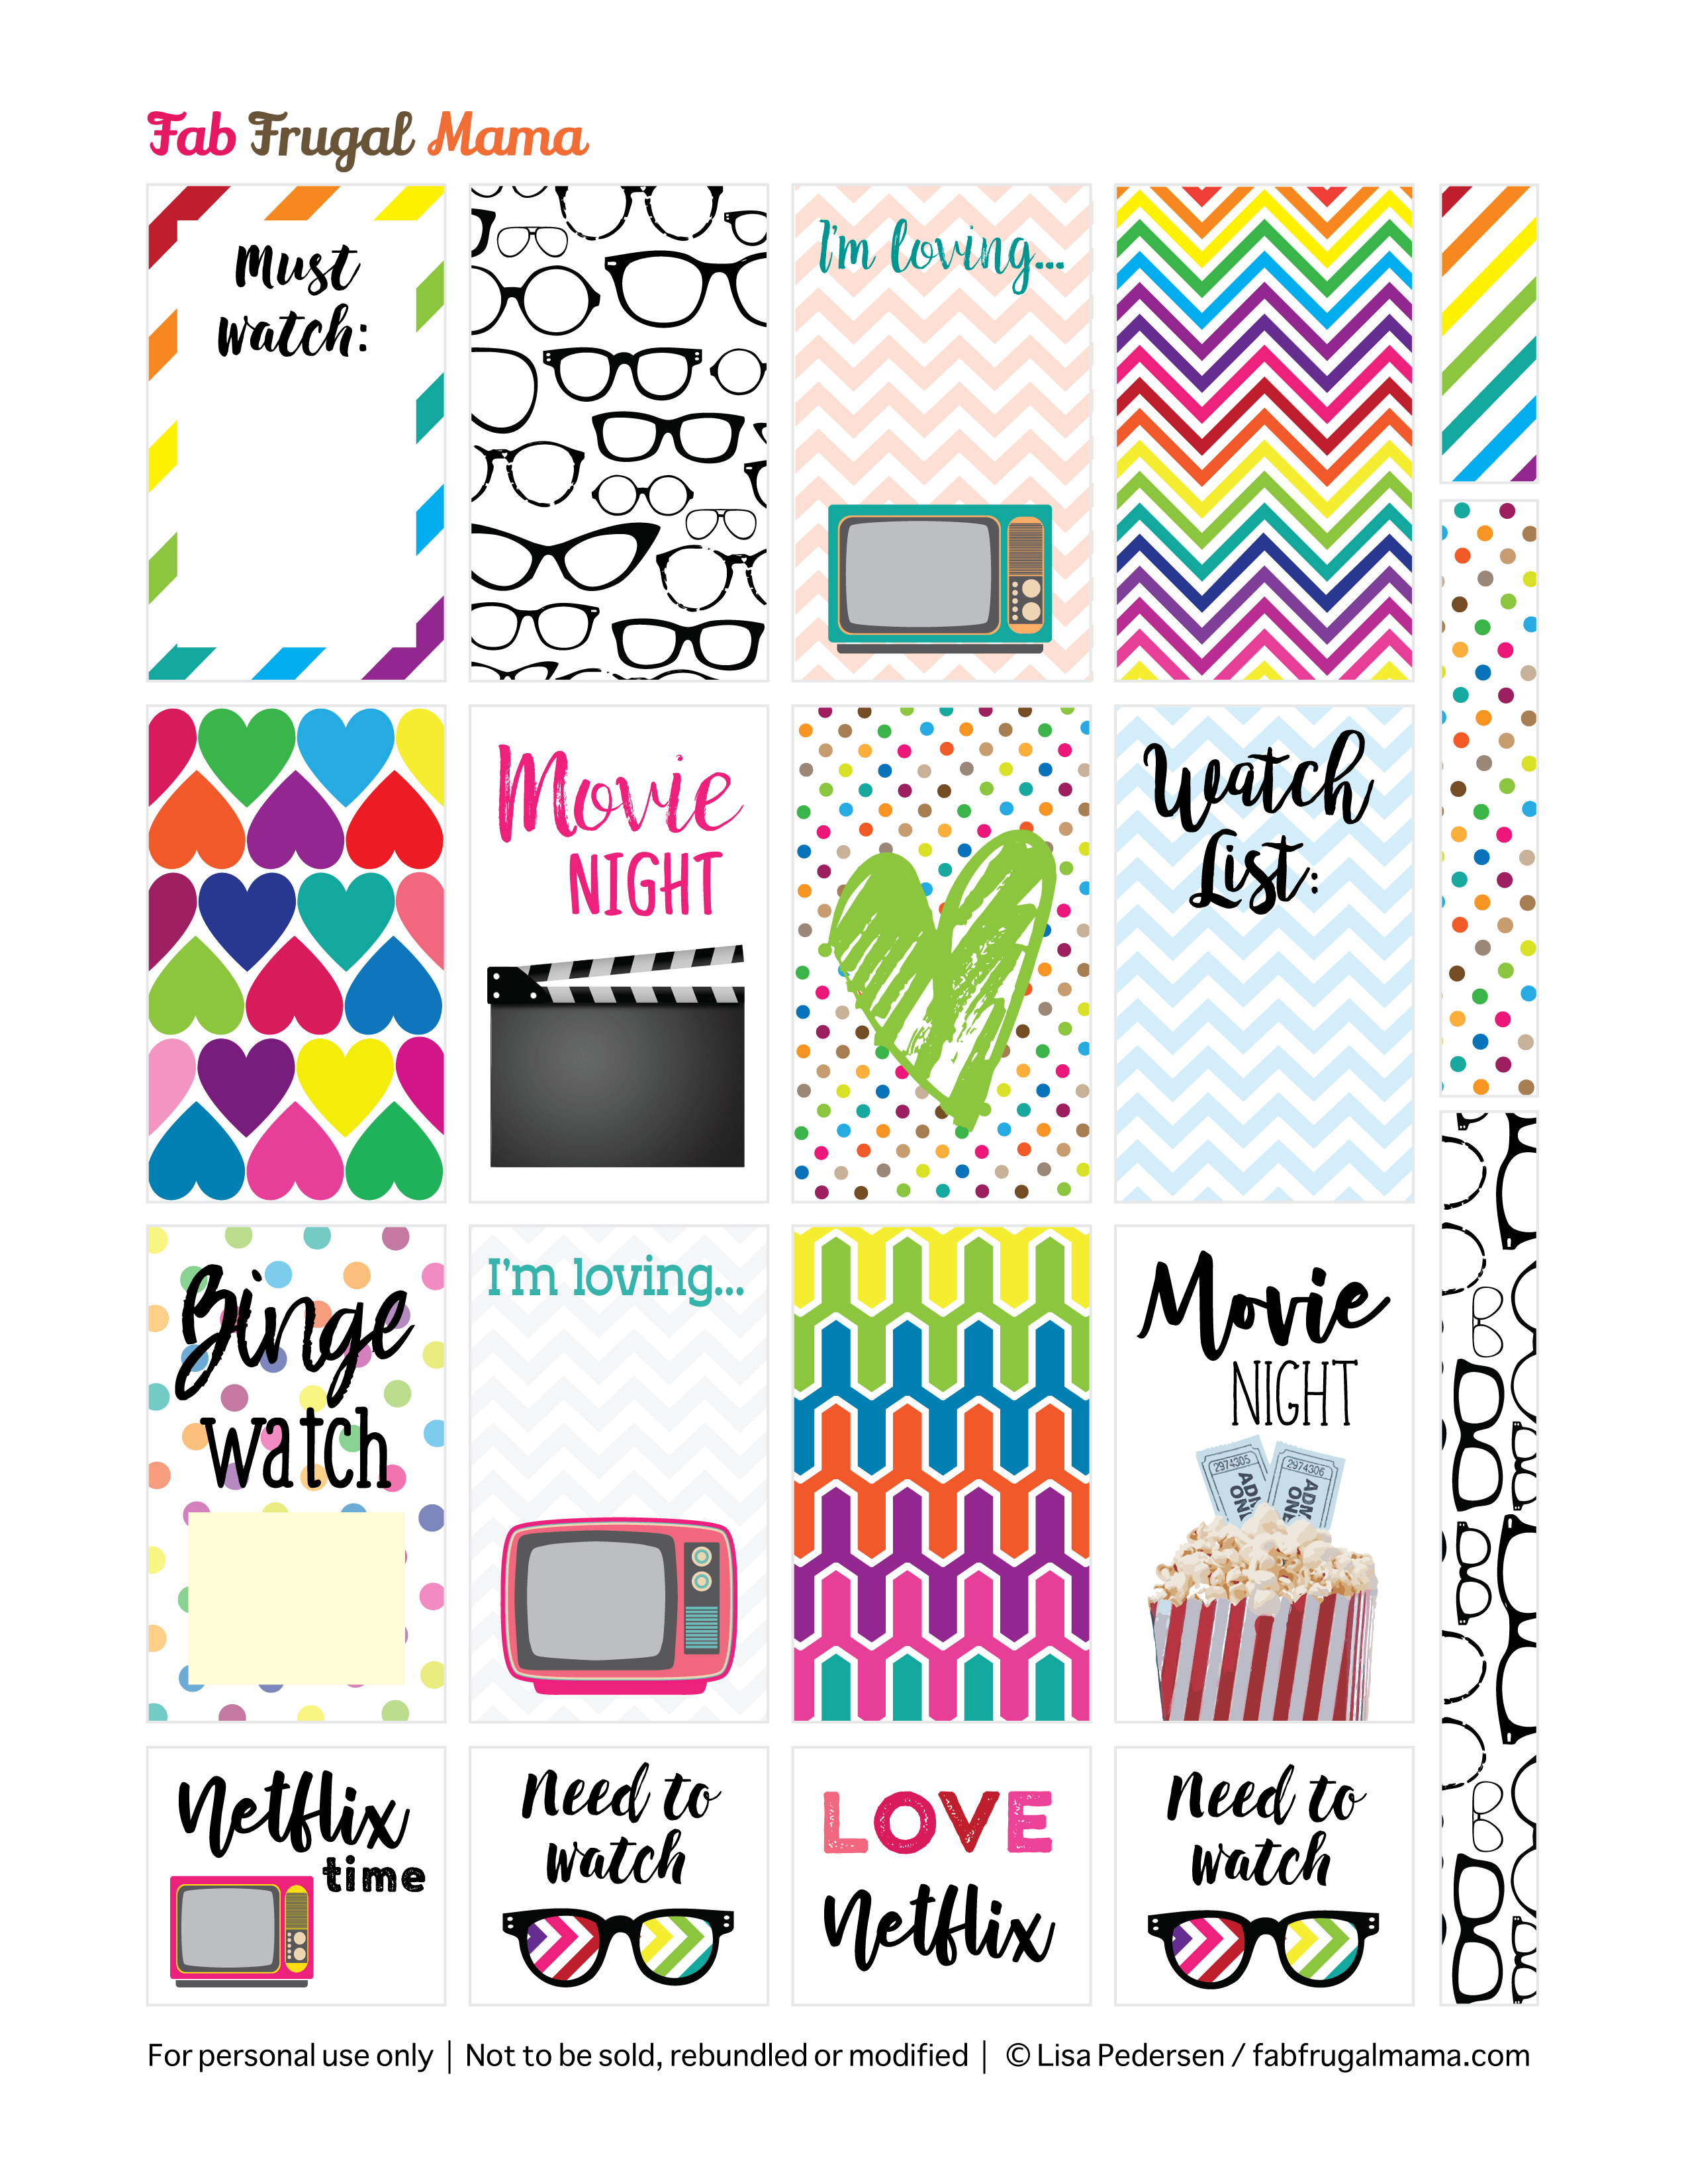 Free Printable Happy Planner Tv & Movie Stickers - Fab Frugal Mama - Free Printable Happy Planner Stickers